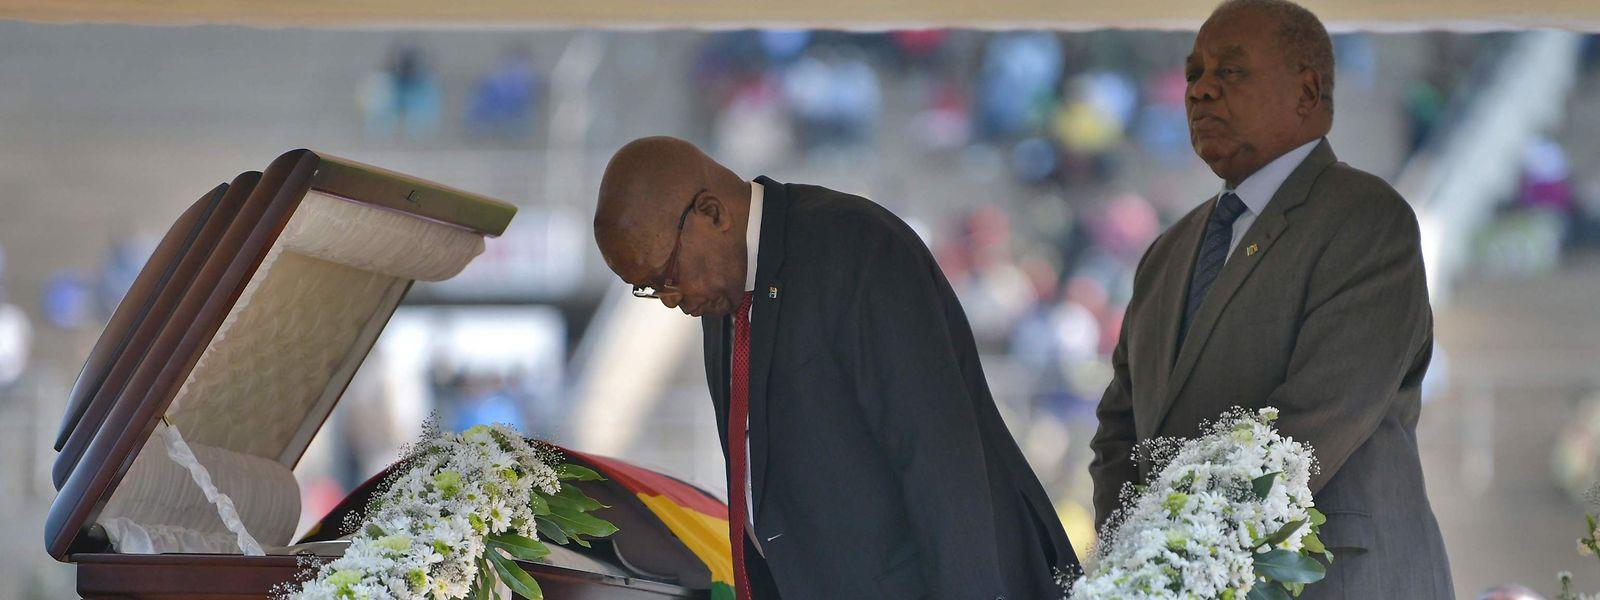 Der frühere Präsident Südafrikas, Jacob Zuma (l.) am offenen Sarg von Robert Mugabe.